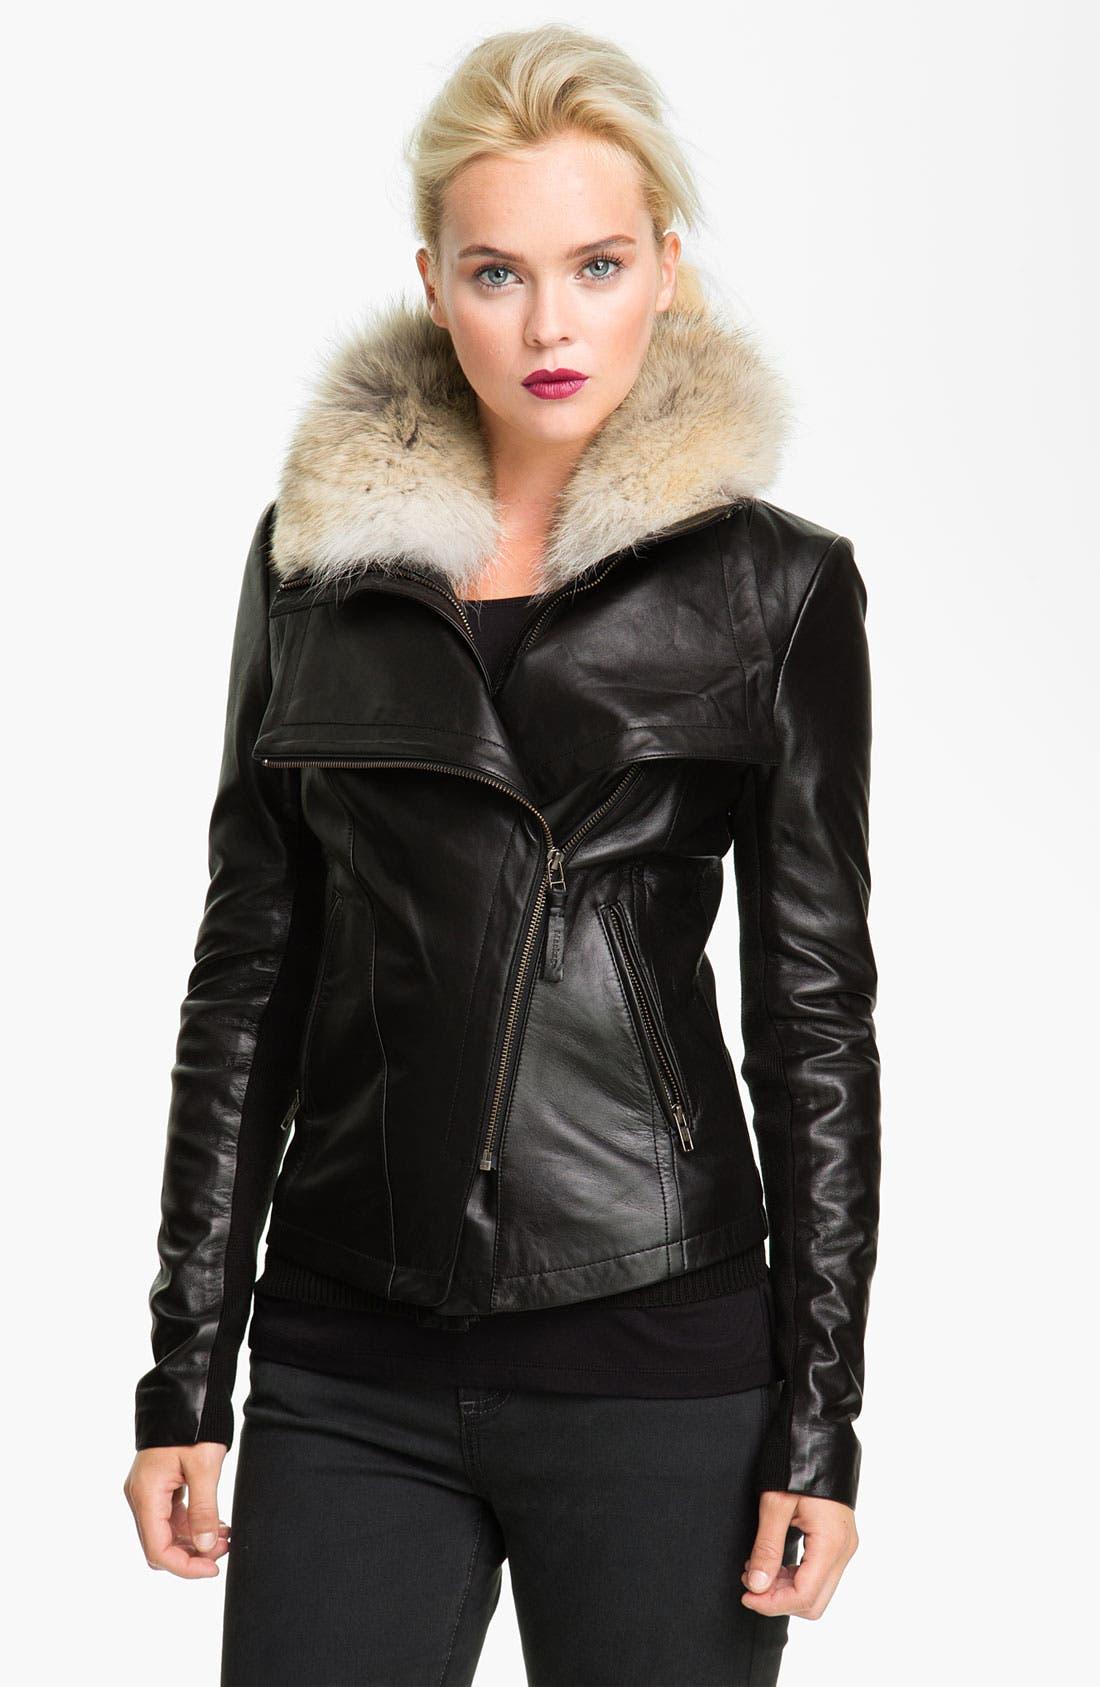 Main Image - Mackage 'Jora' Genuine Coyote Fur Collar Leather Jacket with Removable Vest